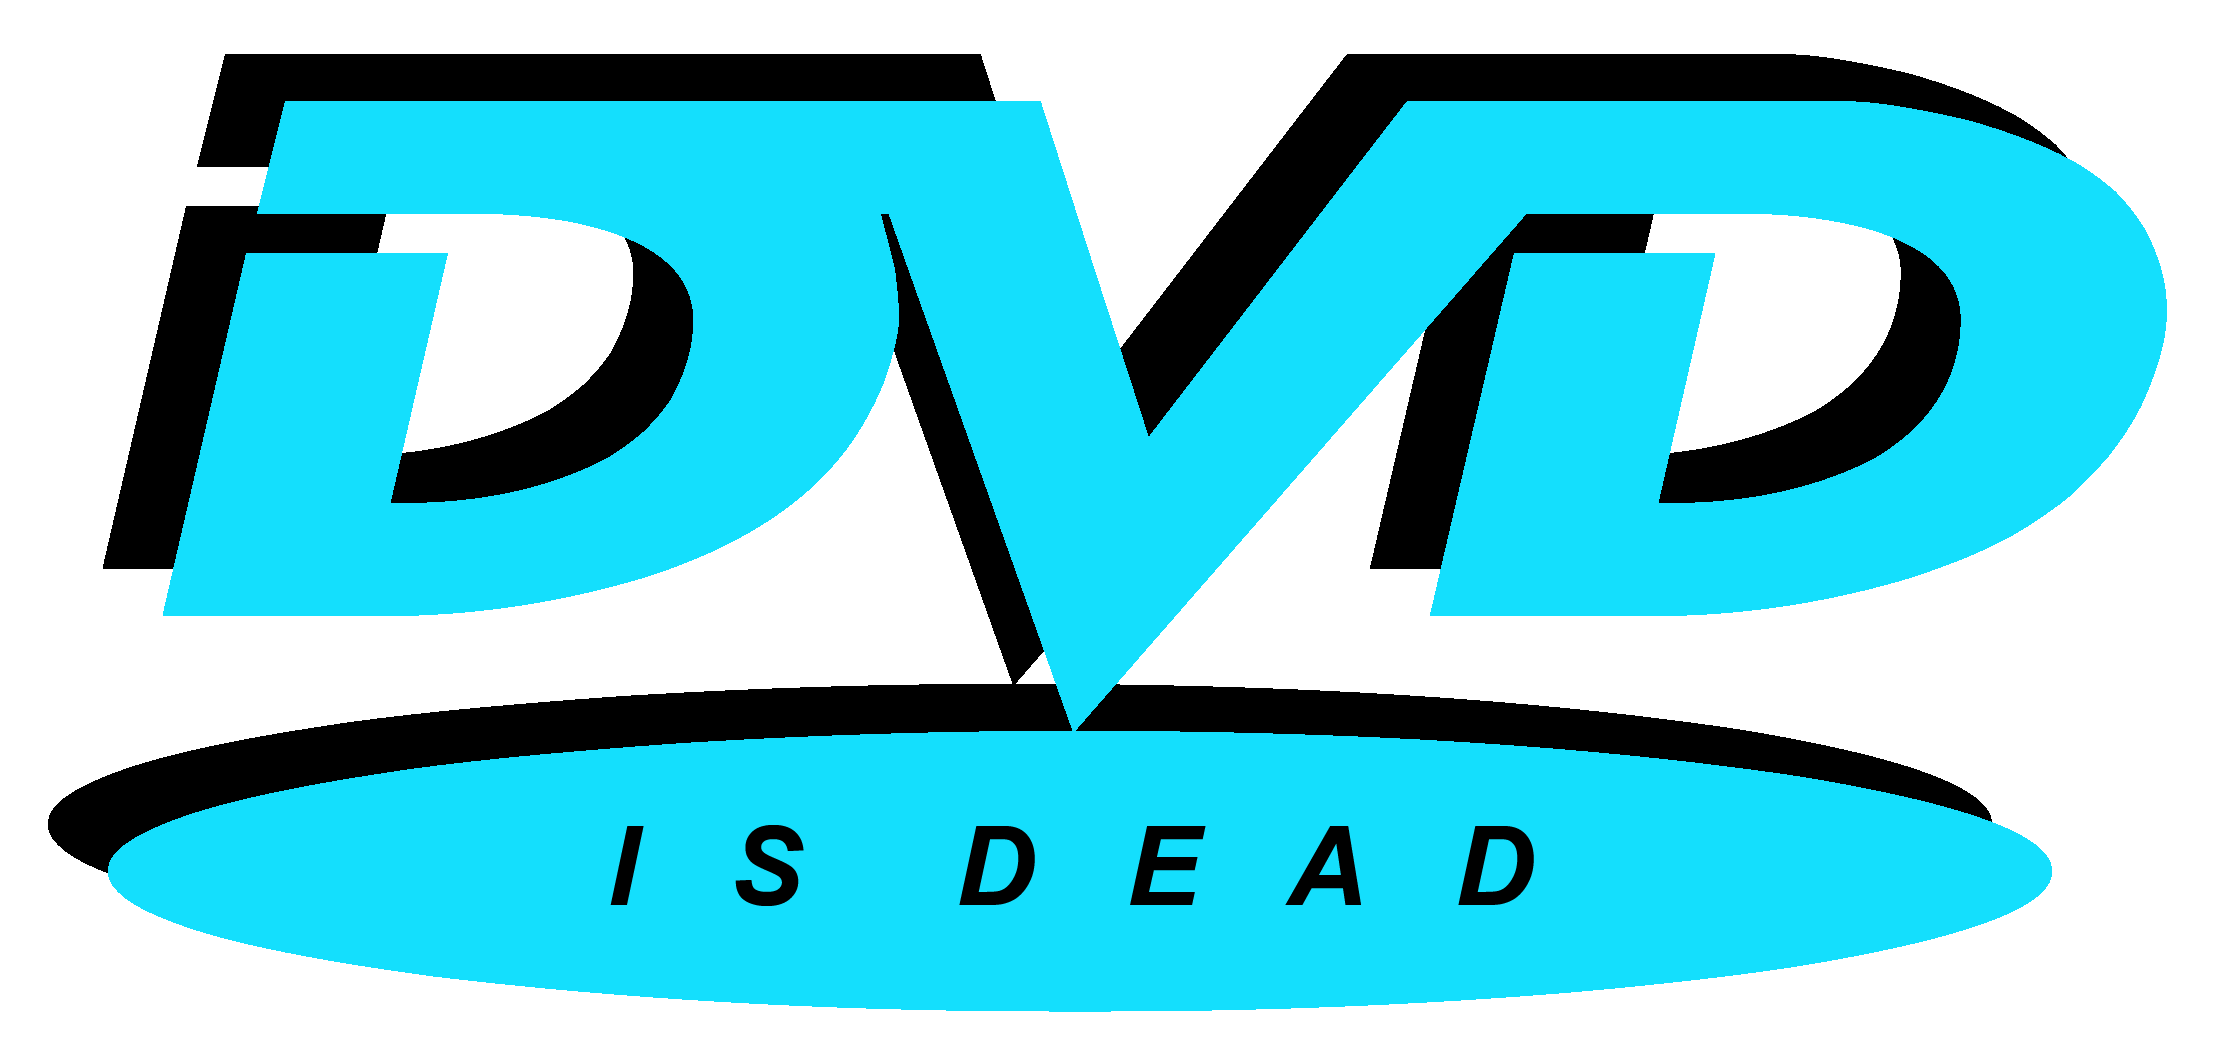 free dvd logo clip art - photo #15